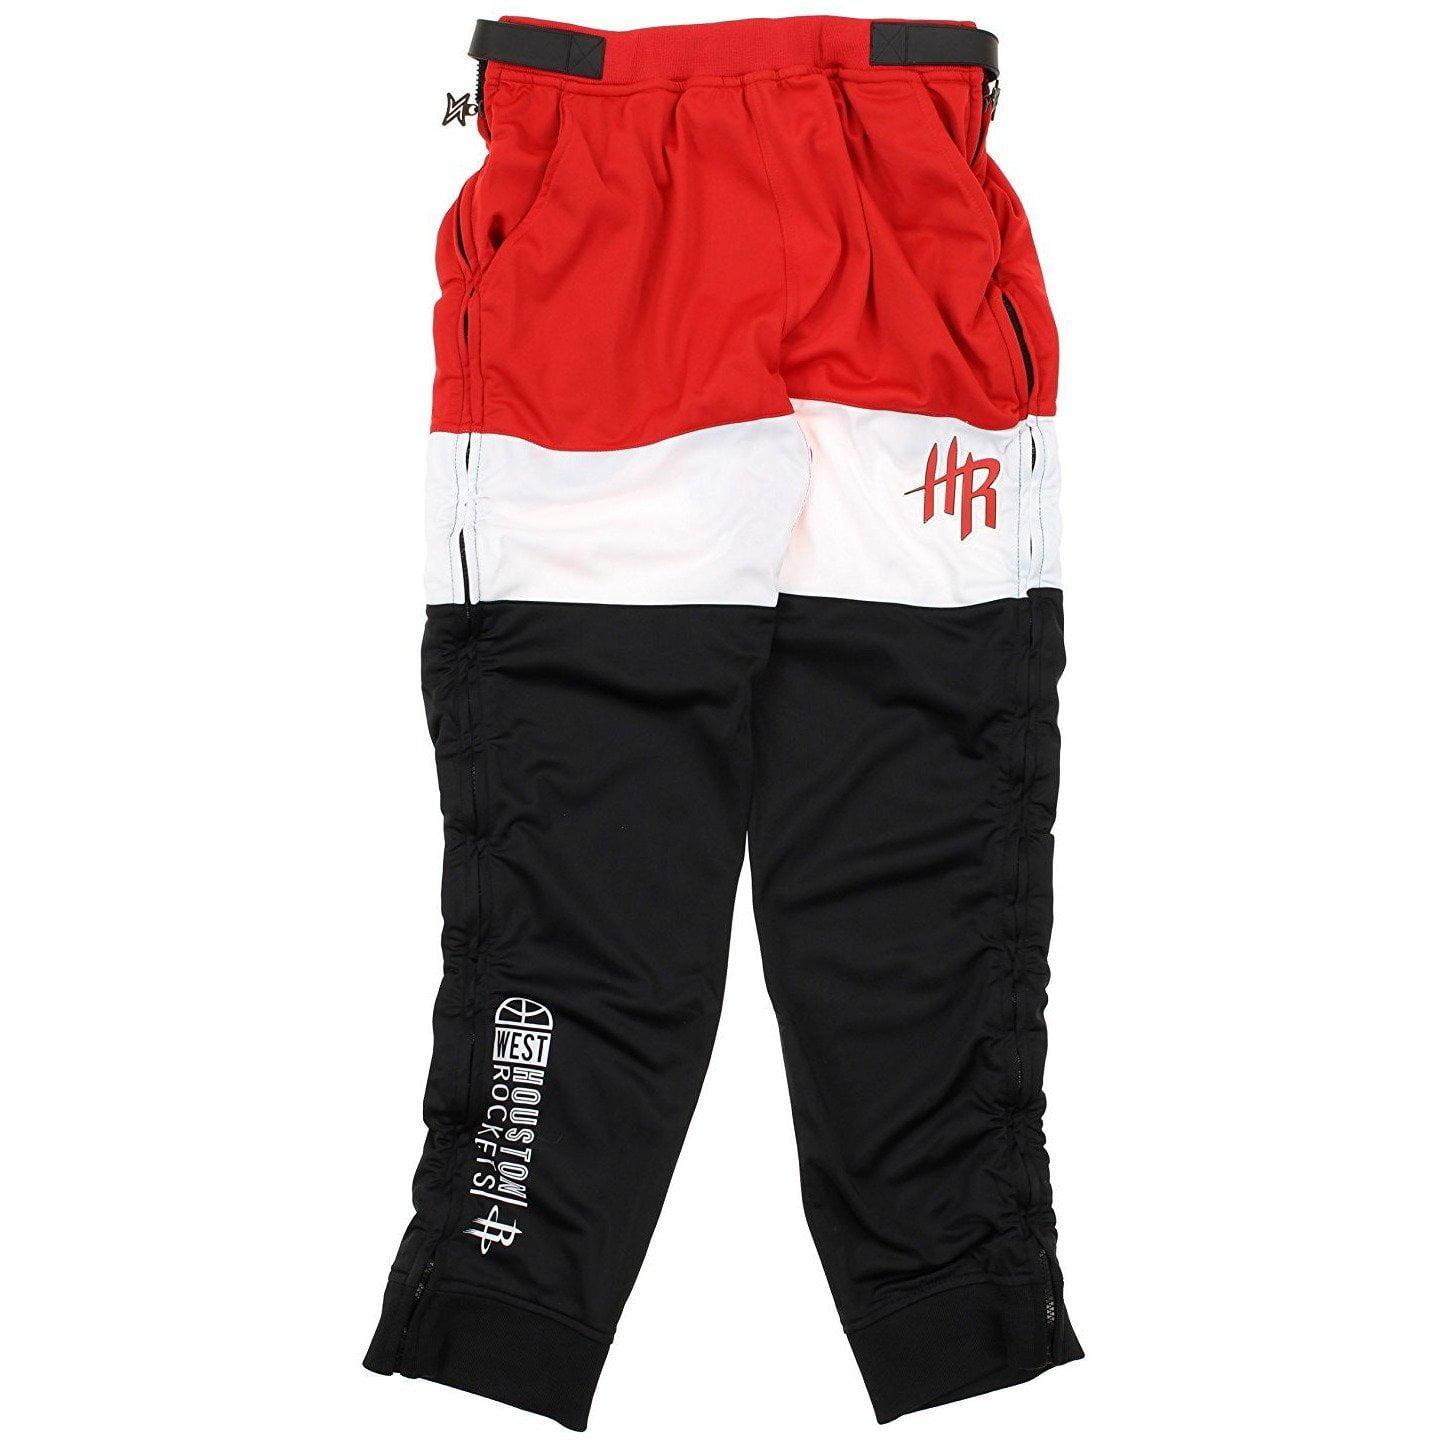 Zipway NBA Men's Houston Rockets Stadium Sport Tear-Away Pants